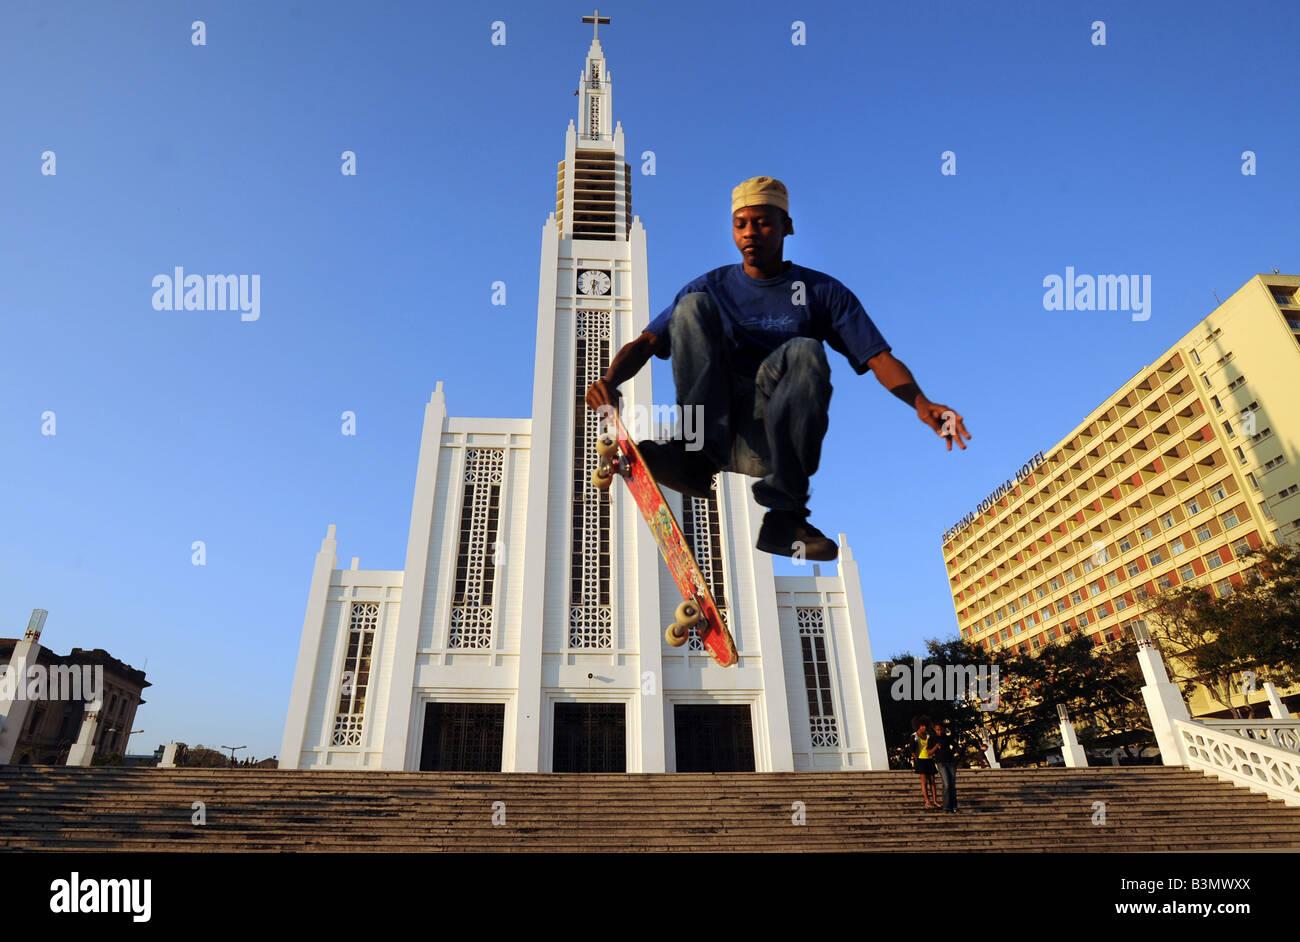 Docas el patinador saltar en el aire fuera de la catedral católica de Nossa Senhora da Conceicao en Maputo, Imagen De Stock